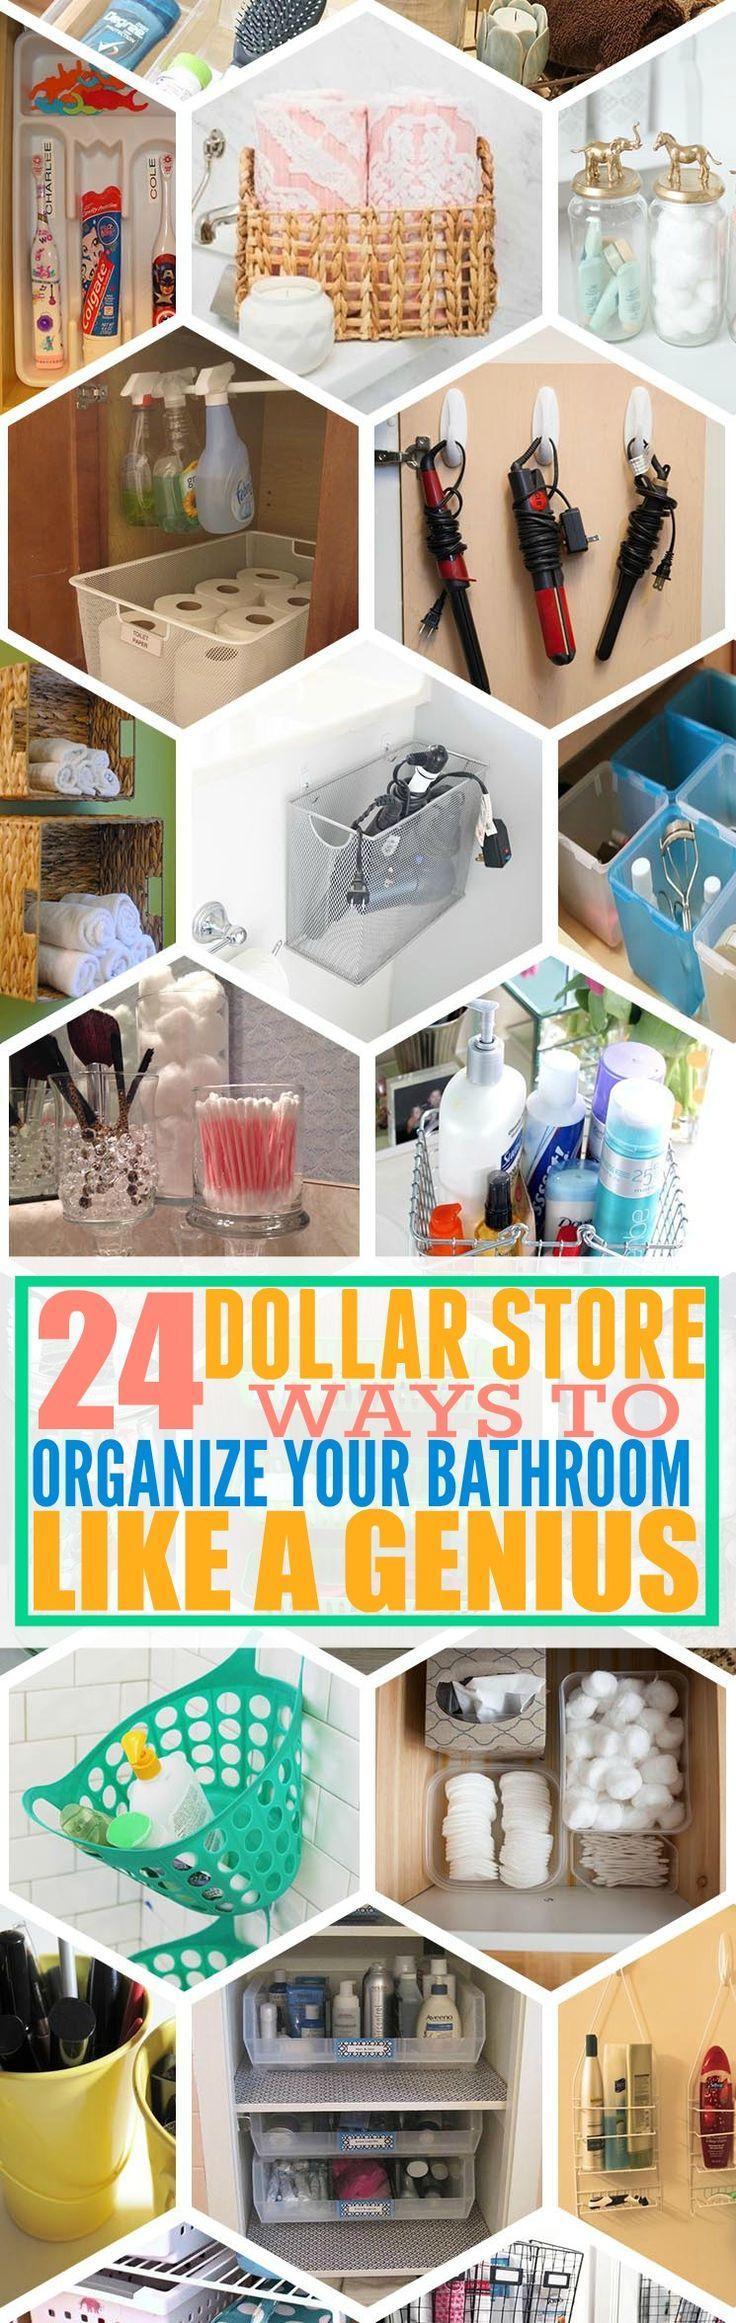 24 Genius Dollar Store Bathroom Organizing Ideas